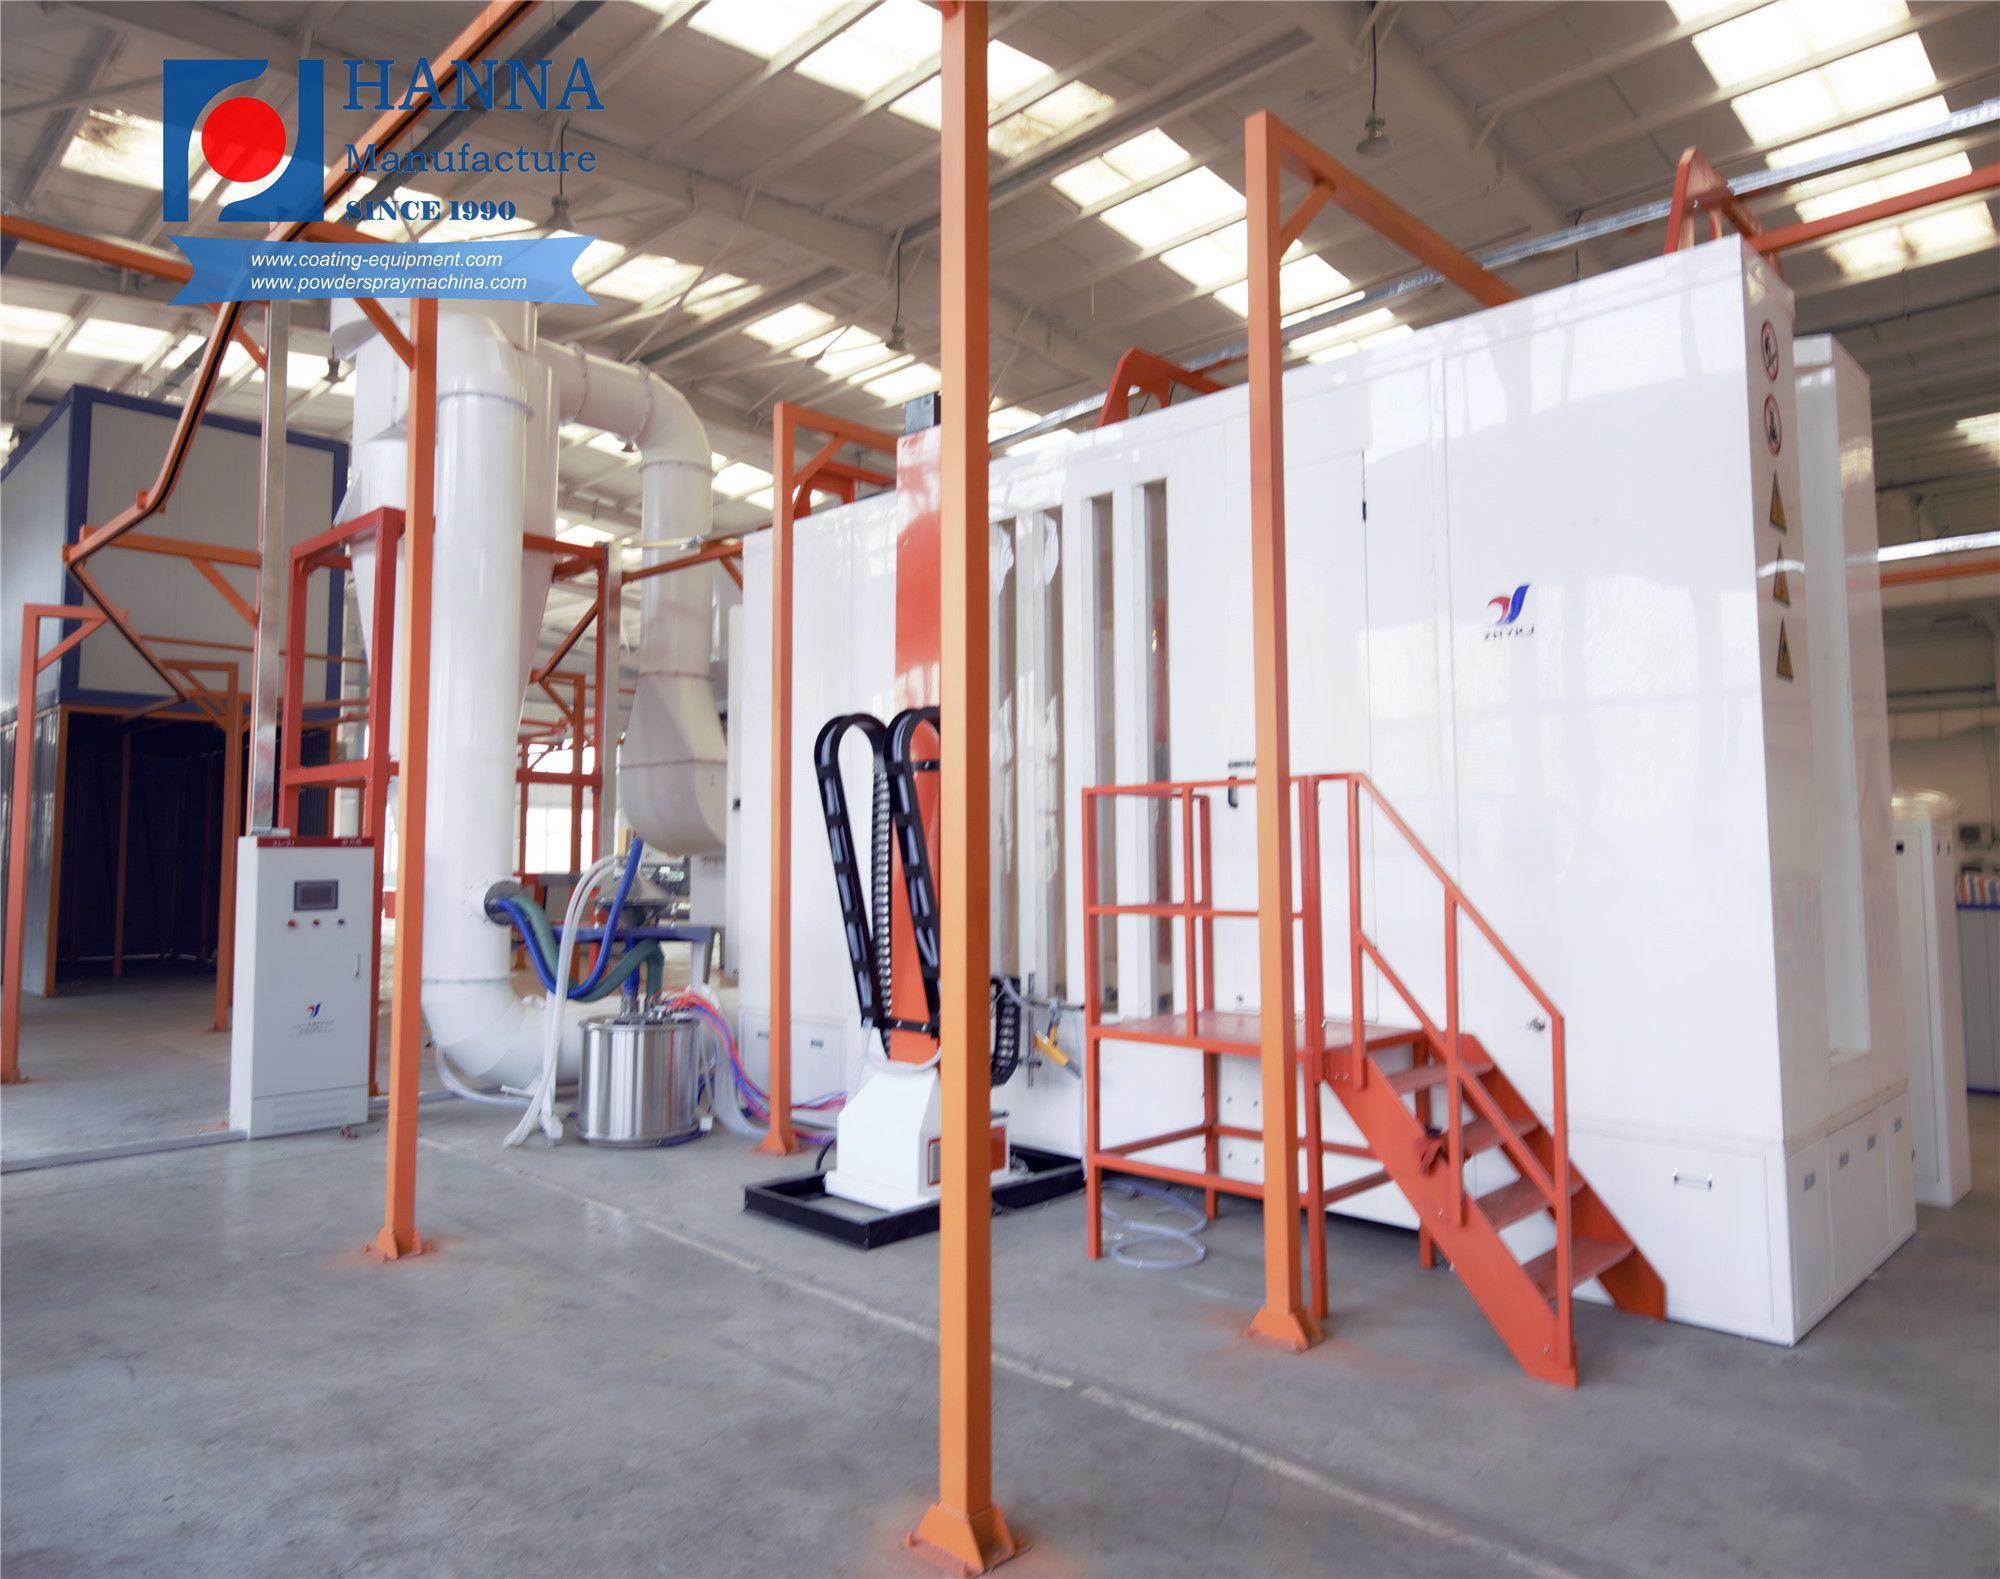 aluminium powder coating equipment Powder coating